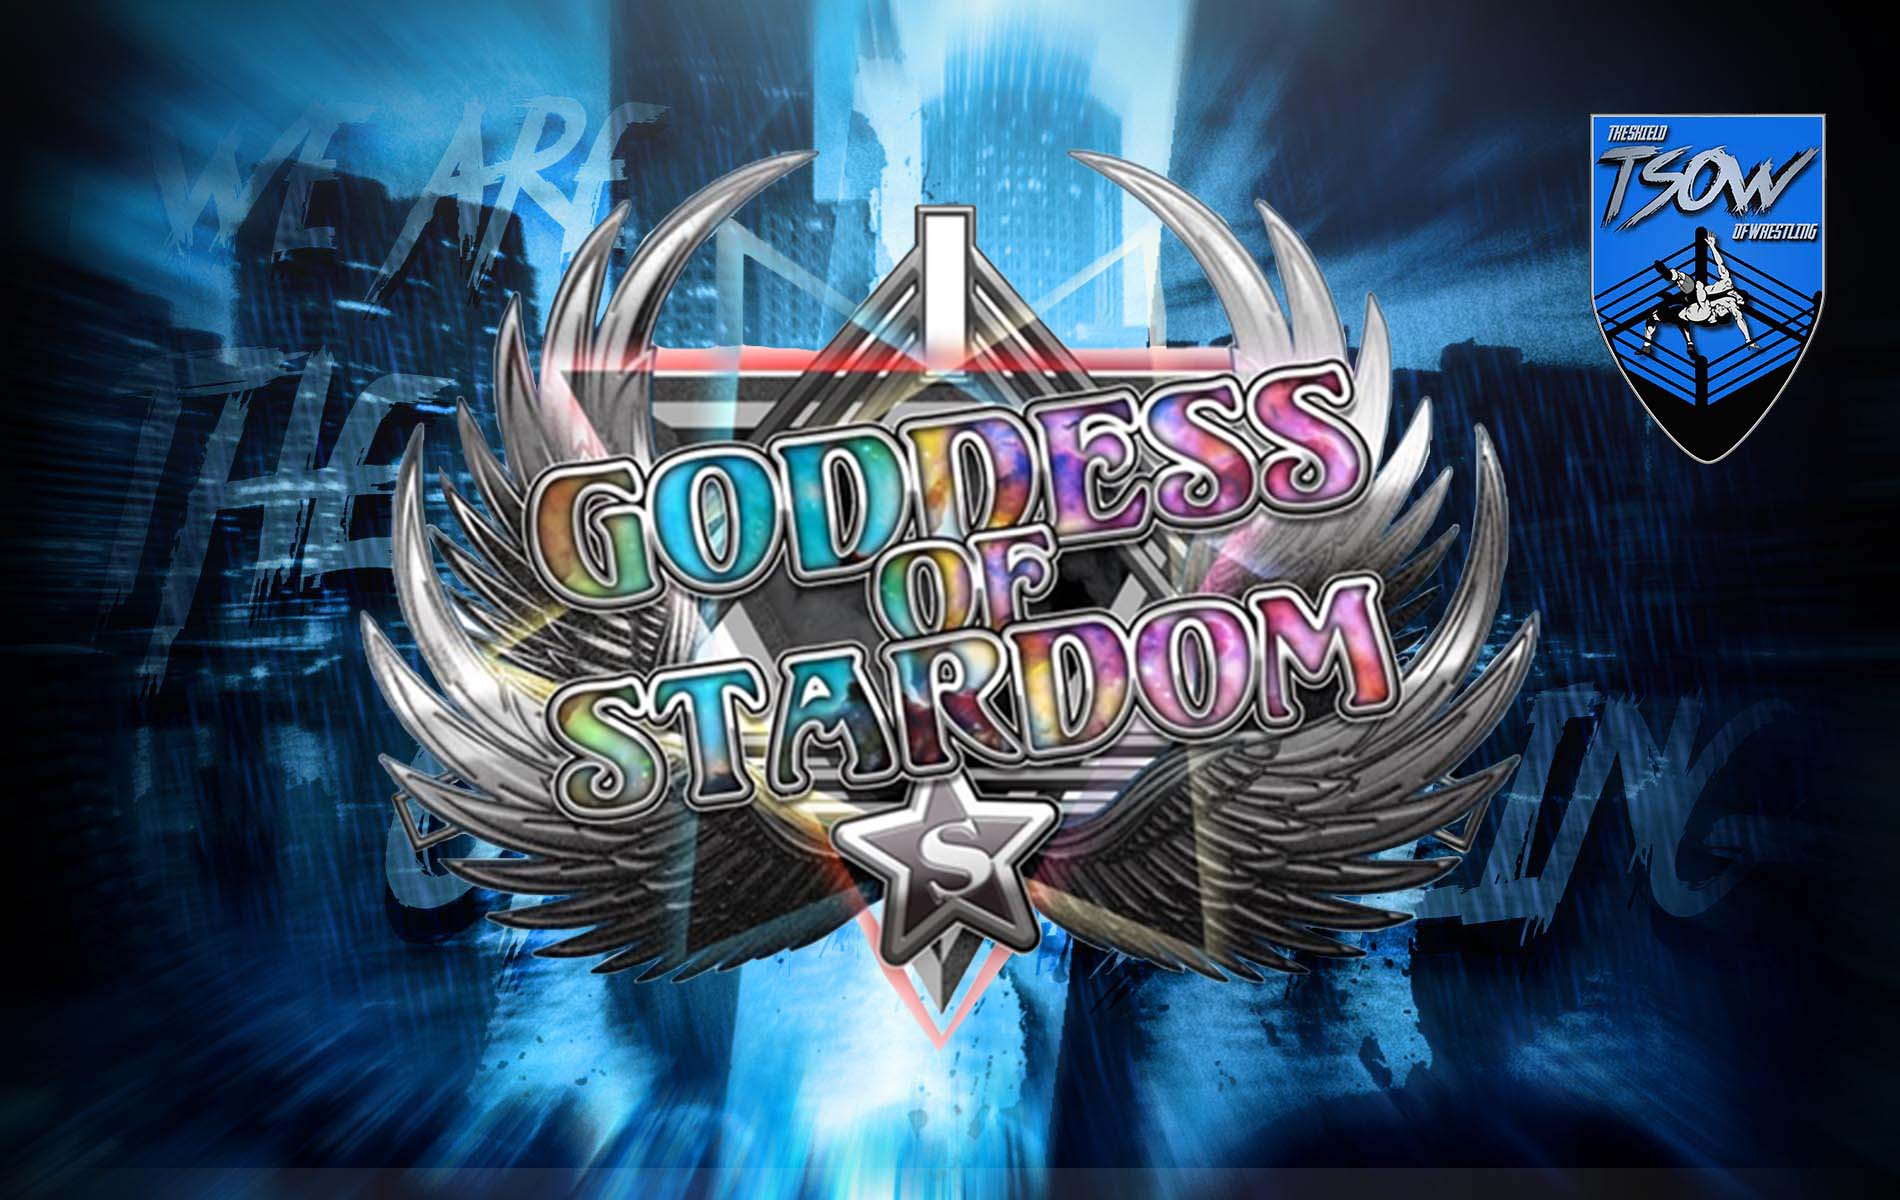 STARDOM Goddess of Stardom Tag League 2020 Risultati – Day 3